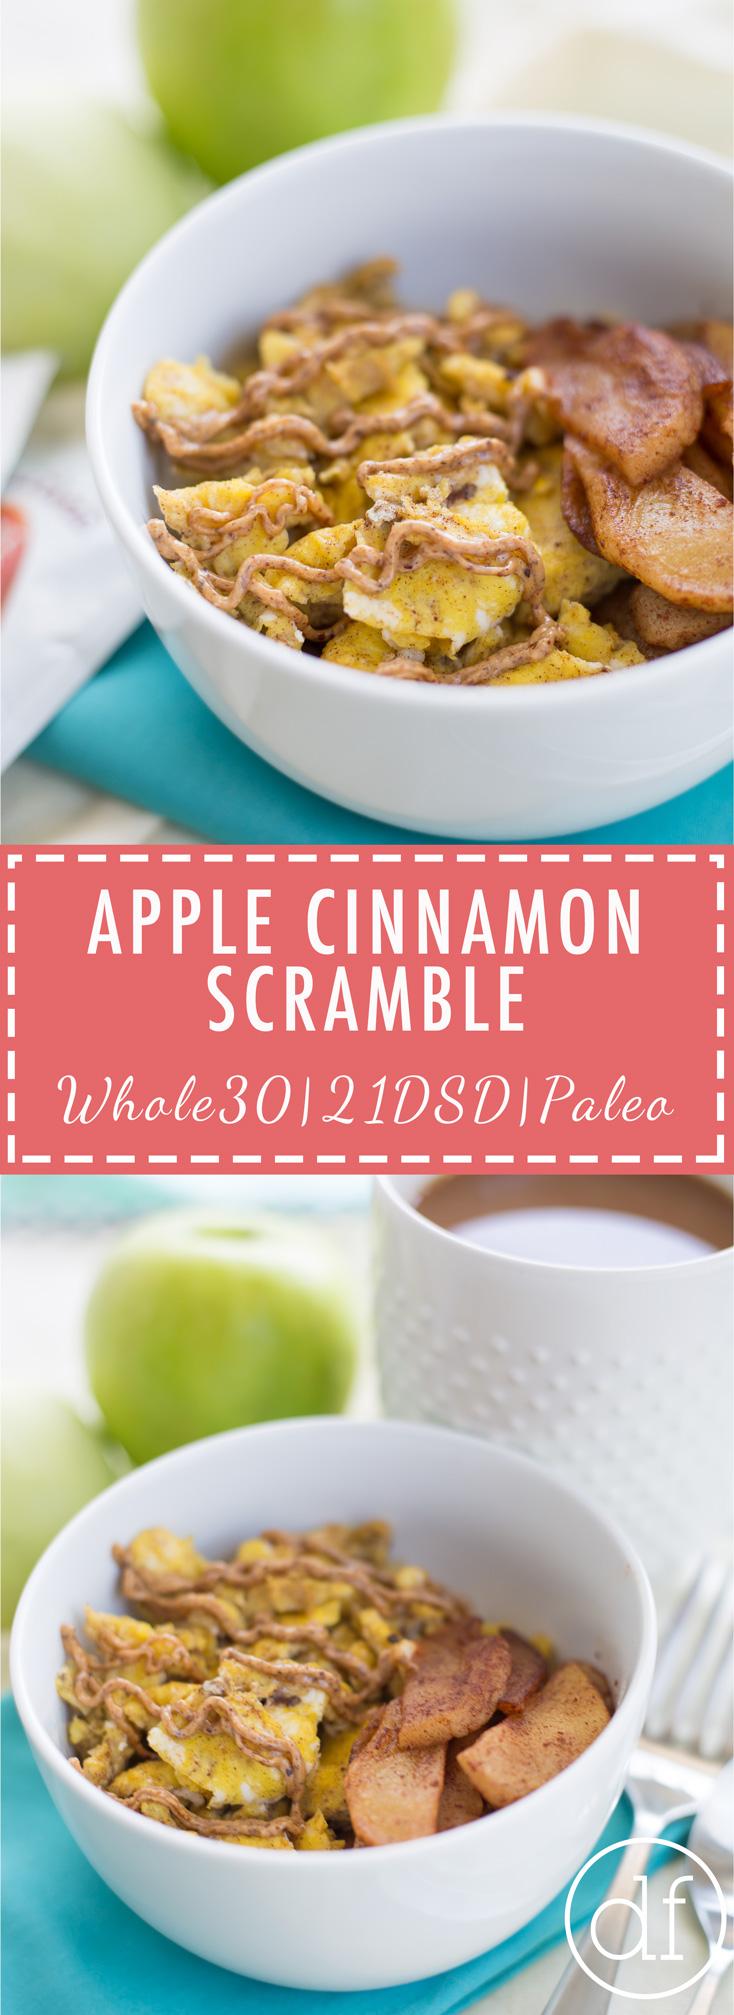 Apple Cinnamon Scramble, 21DSD, 21DSD Approved, 21 Day Sugar Detox, Breakfast, Paleo, Whole30, Easy Recipes, Paleo Recipes, Apple Cinnamon, Breakfast Scramble, 21DSD Coach,